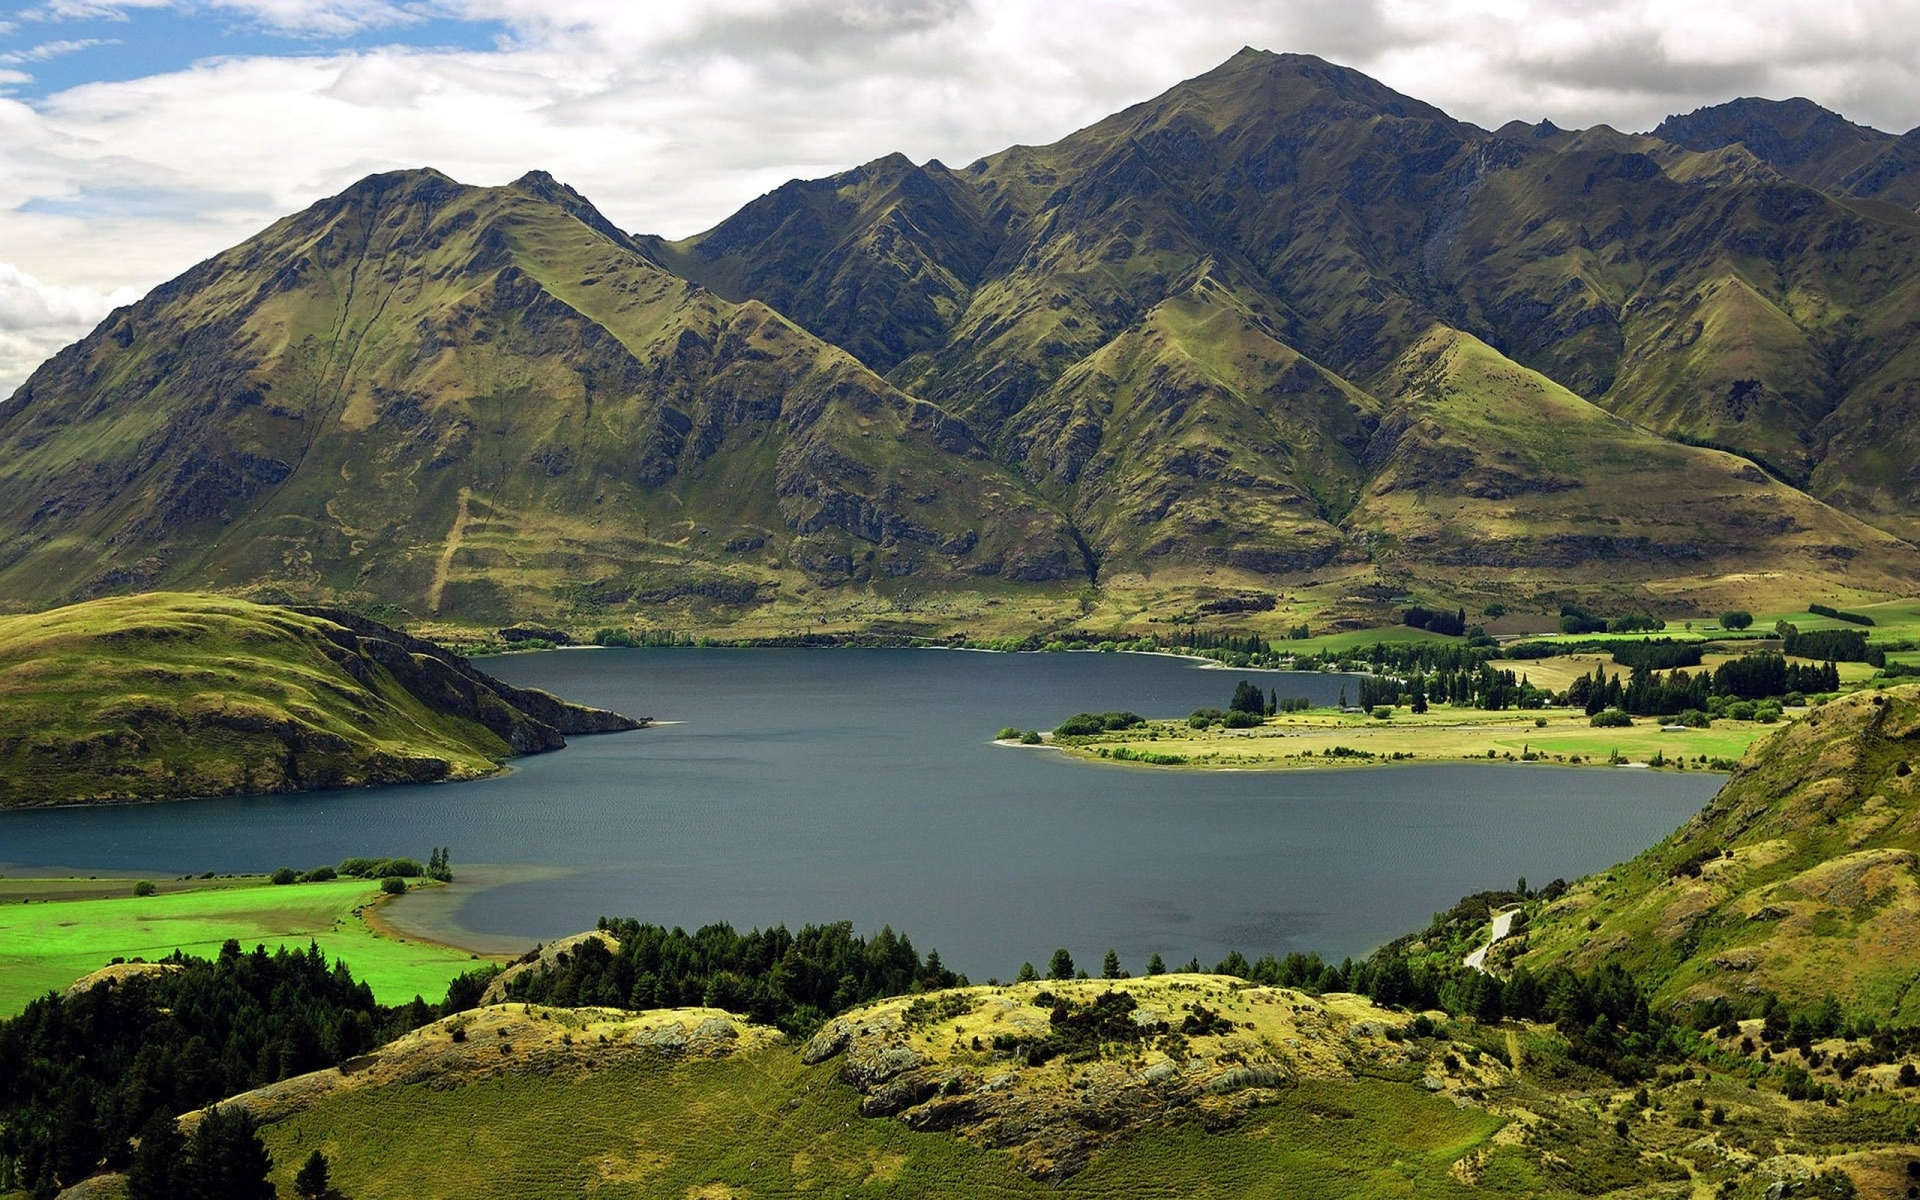 Картинки Горы, небо, трава, озеро фото и обои на рабочий стол